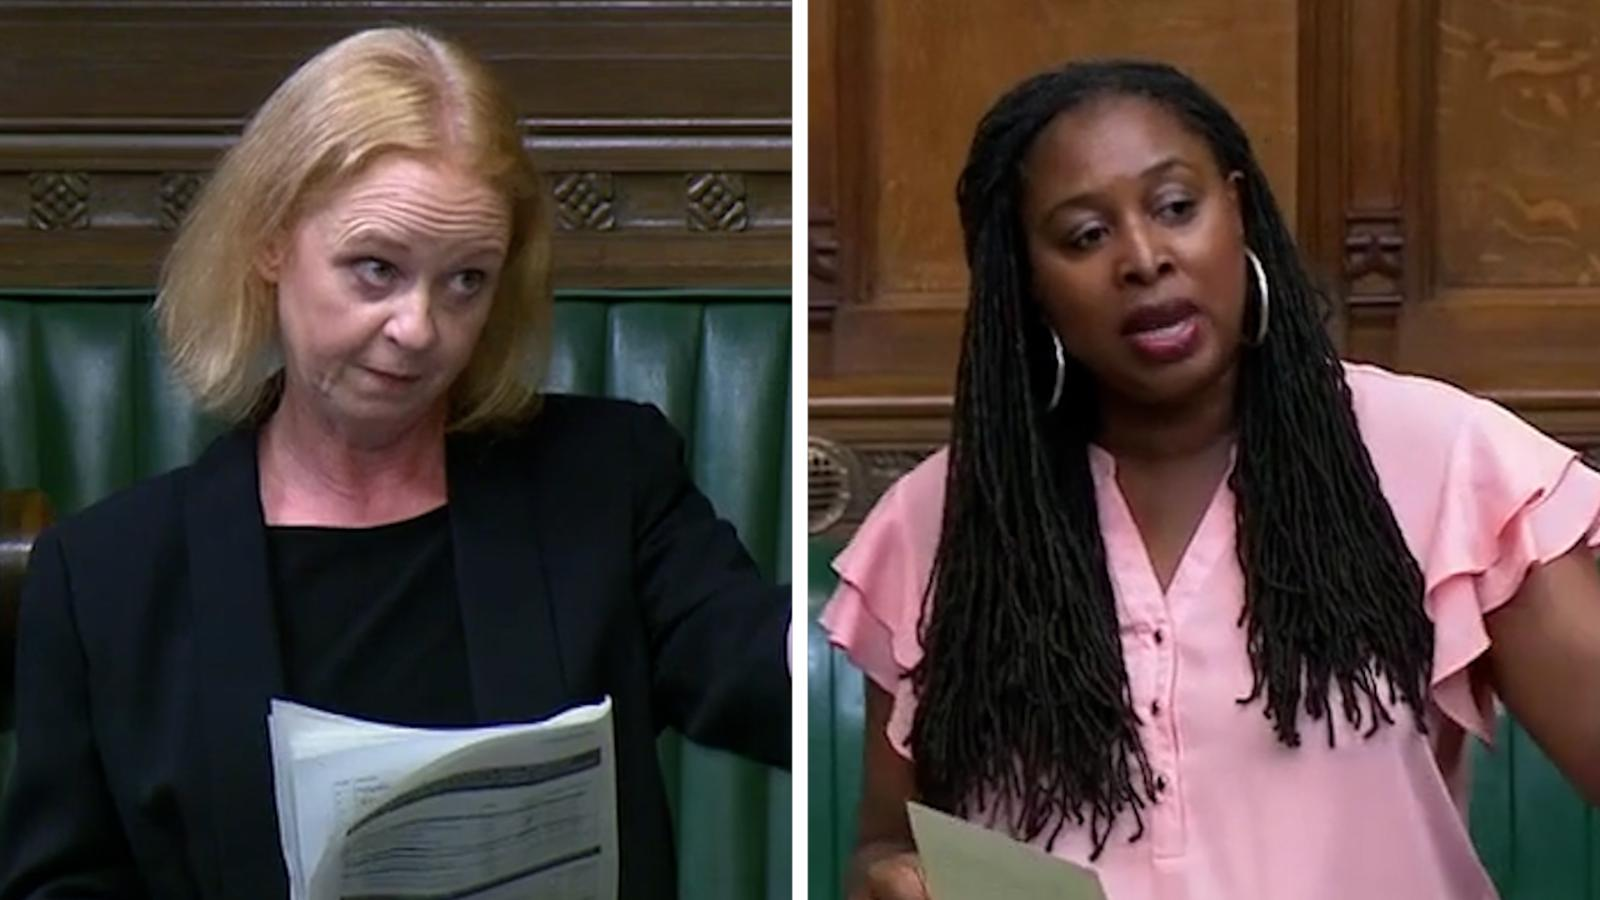 Expulsan a parlamentaria británica por decir que Boris Johnson mintió durante la pandemia